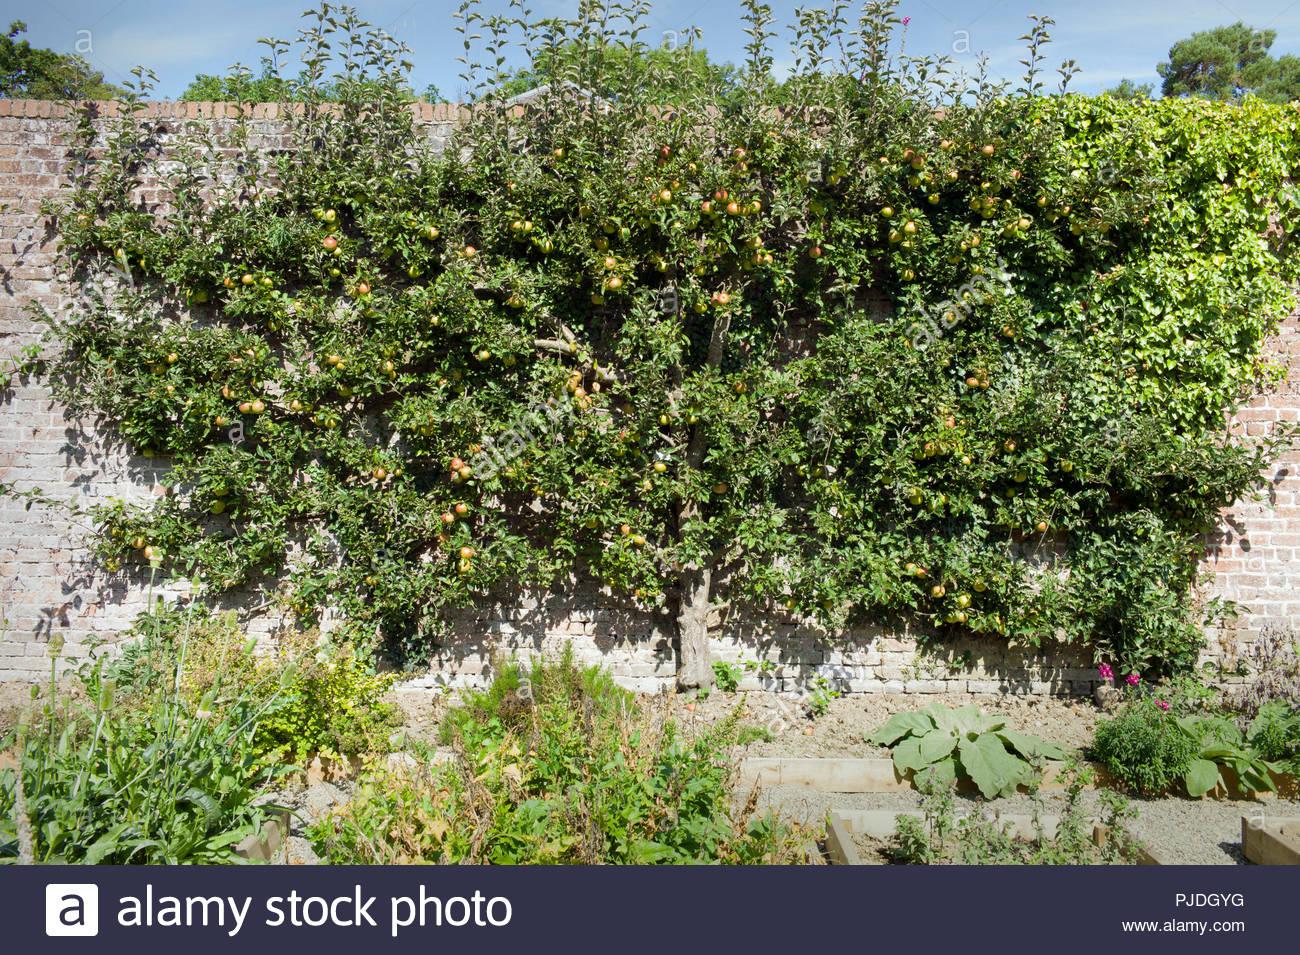 A vintage espalier apple tree, variety 'Jonathen', in the walled kitchen garden at Llanerchaeron Villa, Ceredigion, Wales, UK Stock Photo